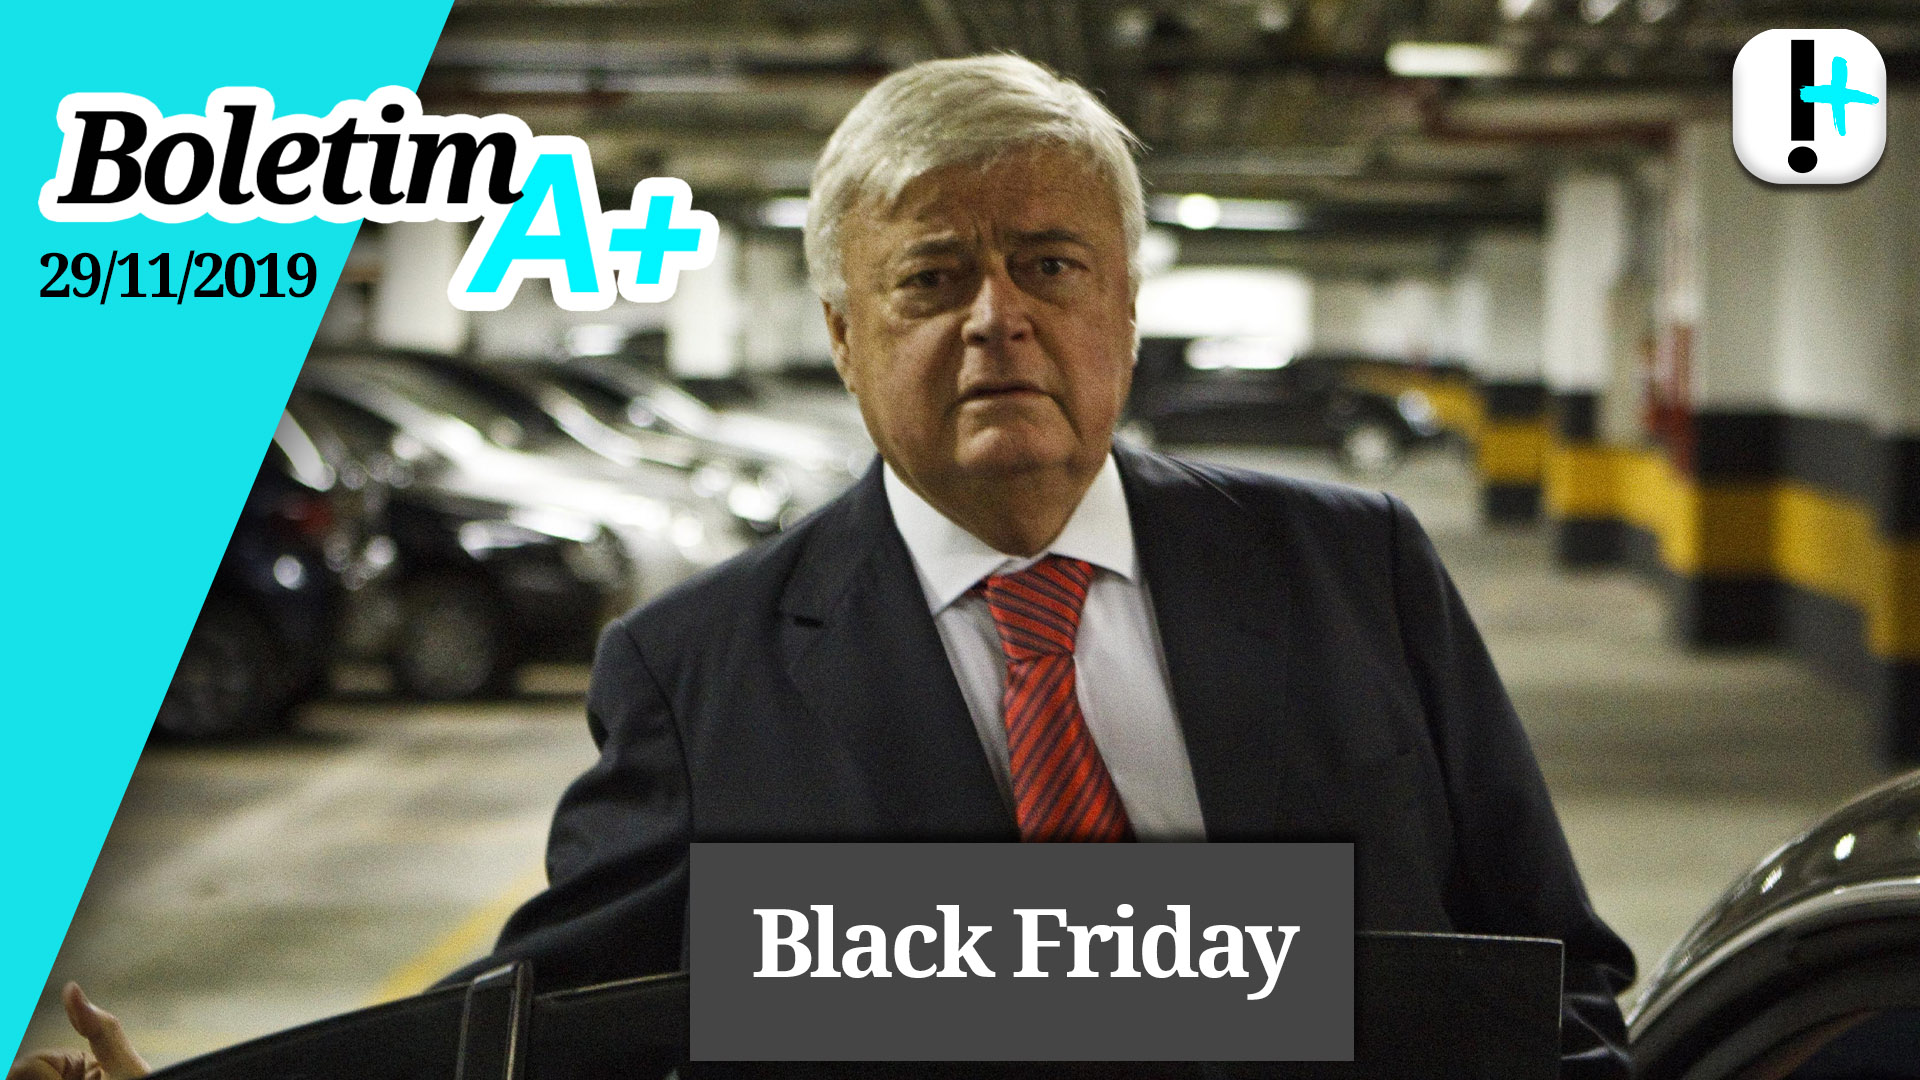 Boletim A+: Black Friday